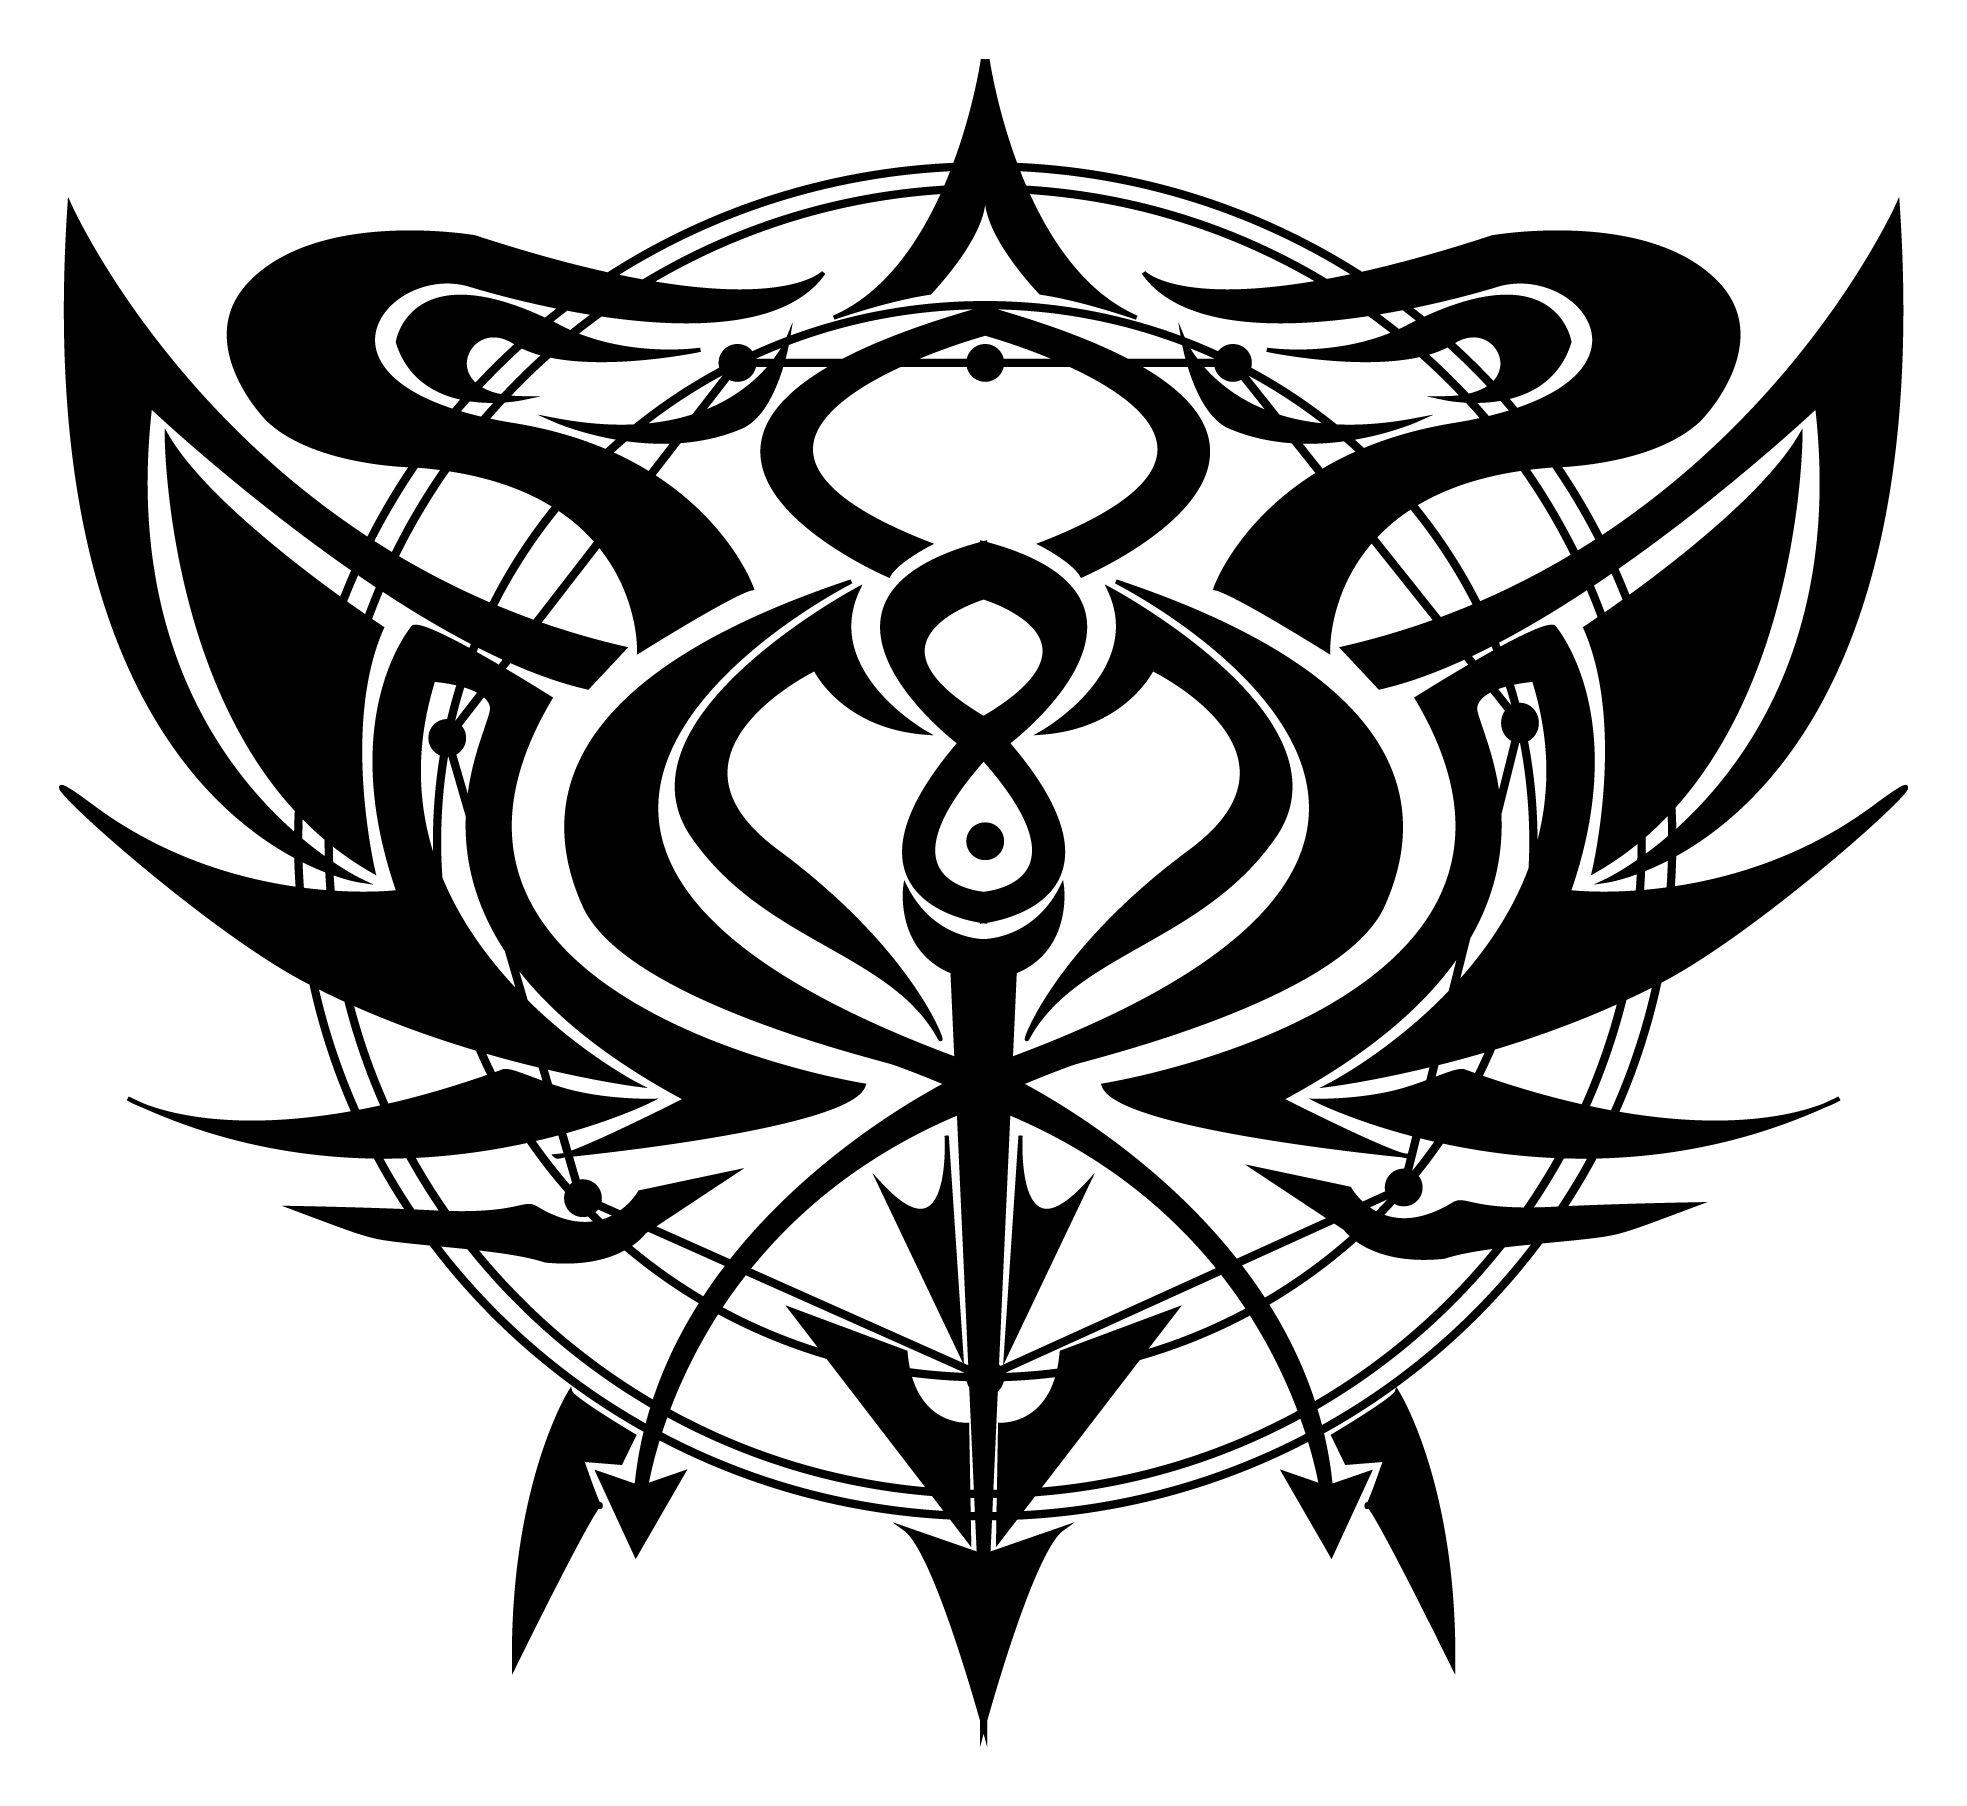 Transmutation Circle Tattoo: Fullmetal Alchemist Transmutation Circle